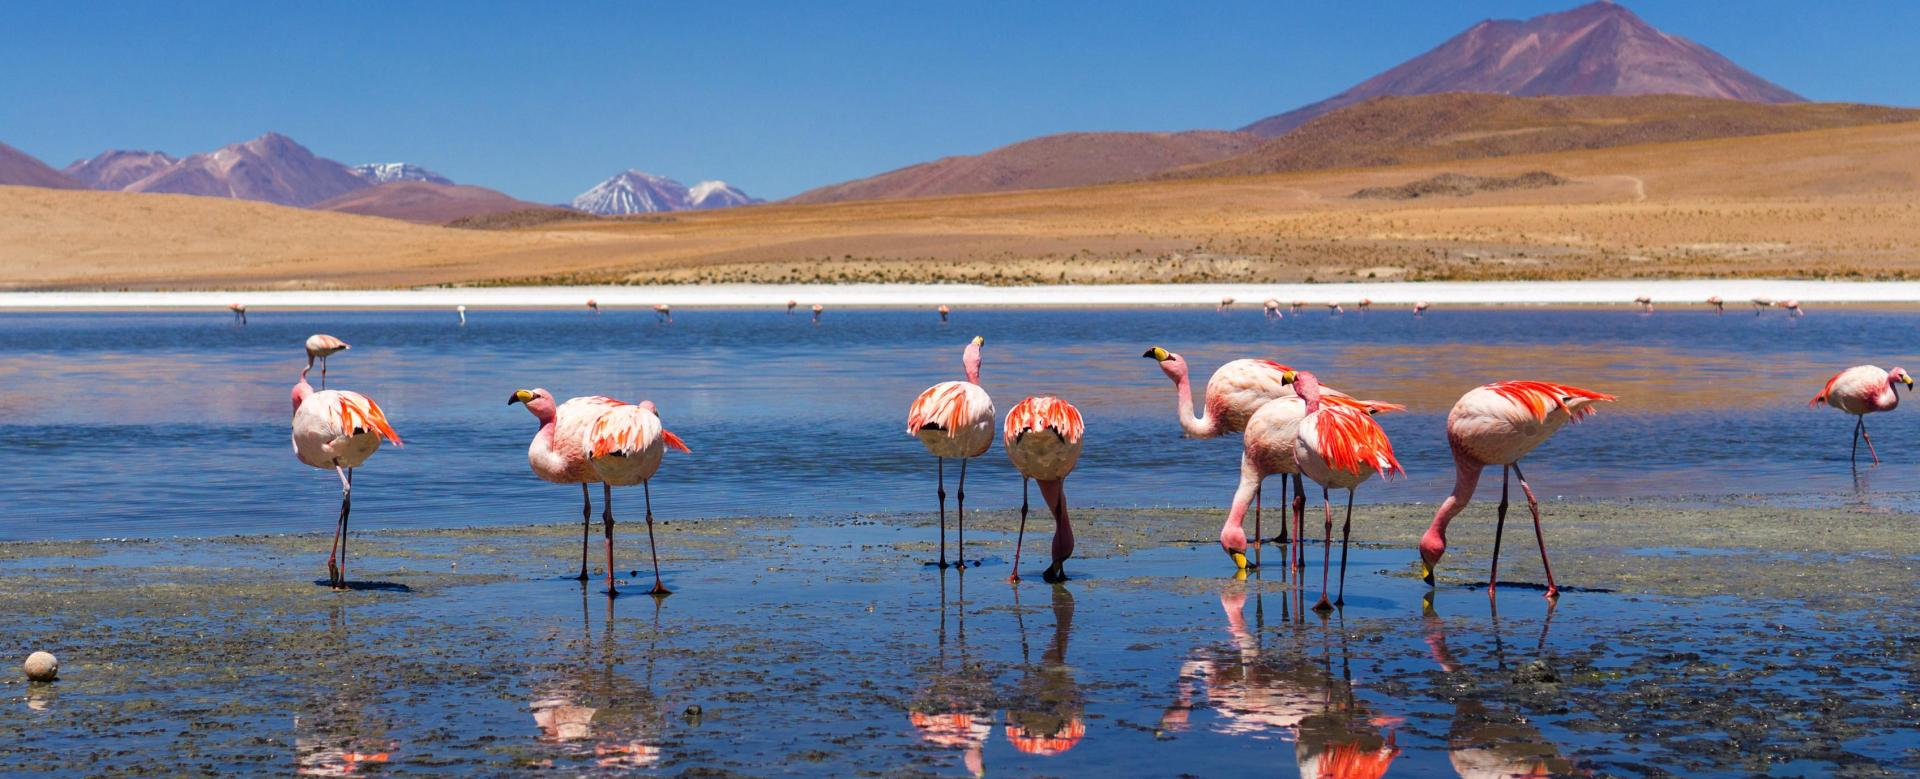 Trekking Bolivie : Sud-lípez et atacama (22 j)